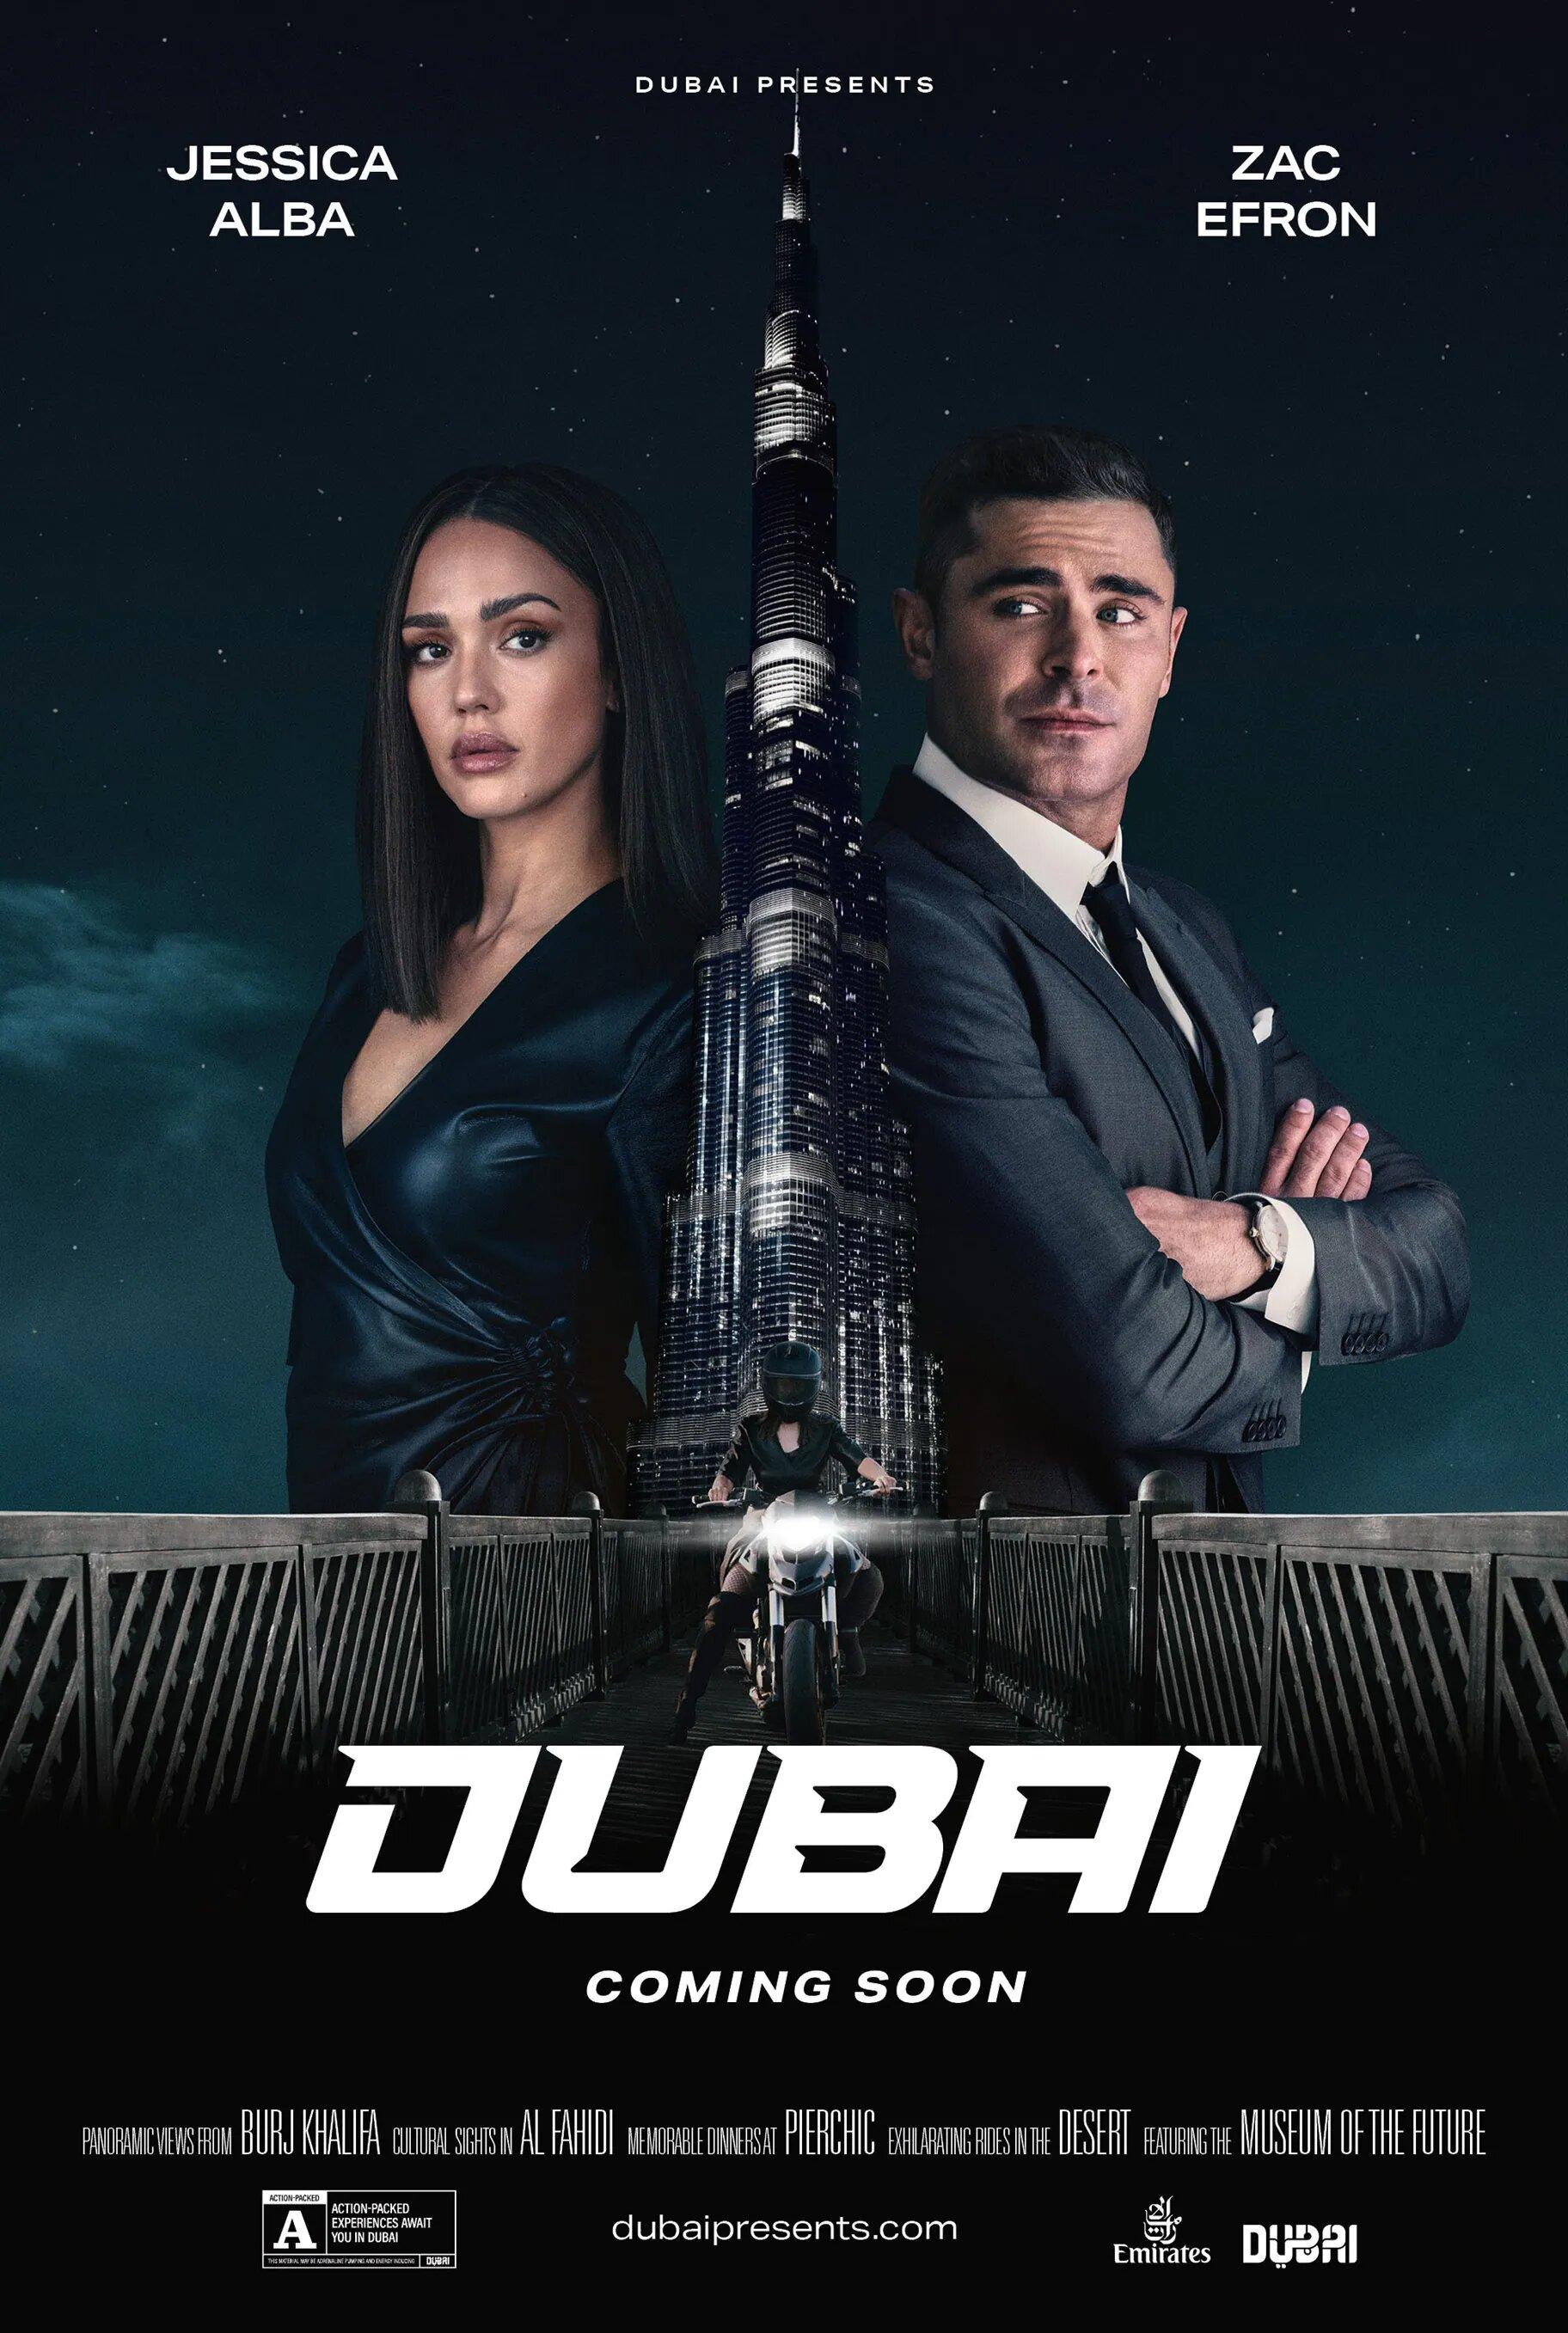 Dubai Presents